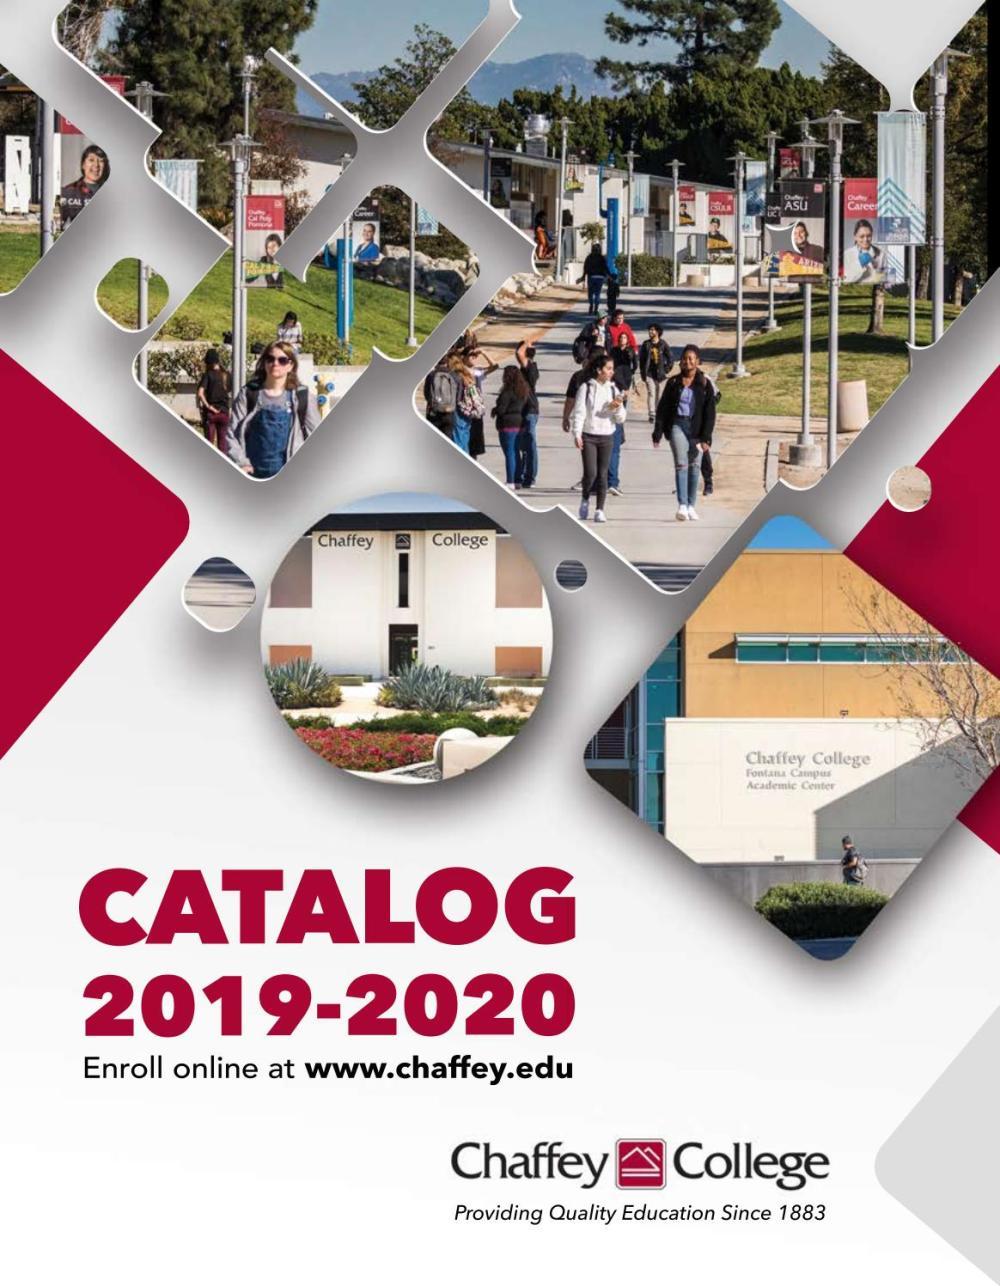 medium resolution of Chaffey College Catalog 2019 - 2020 by Chaffey College - issuu